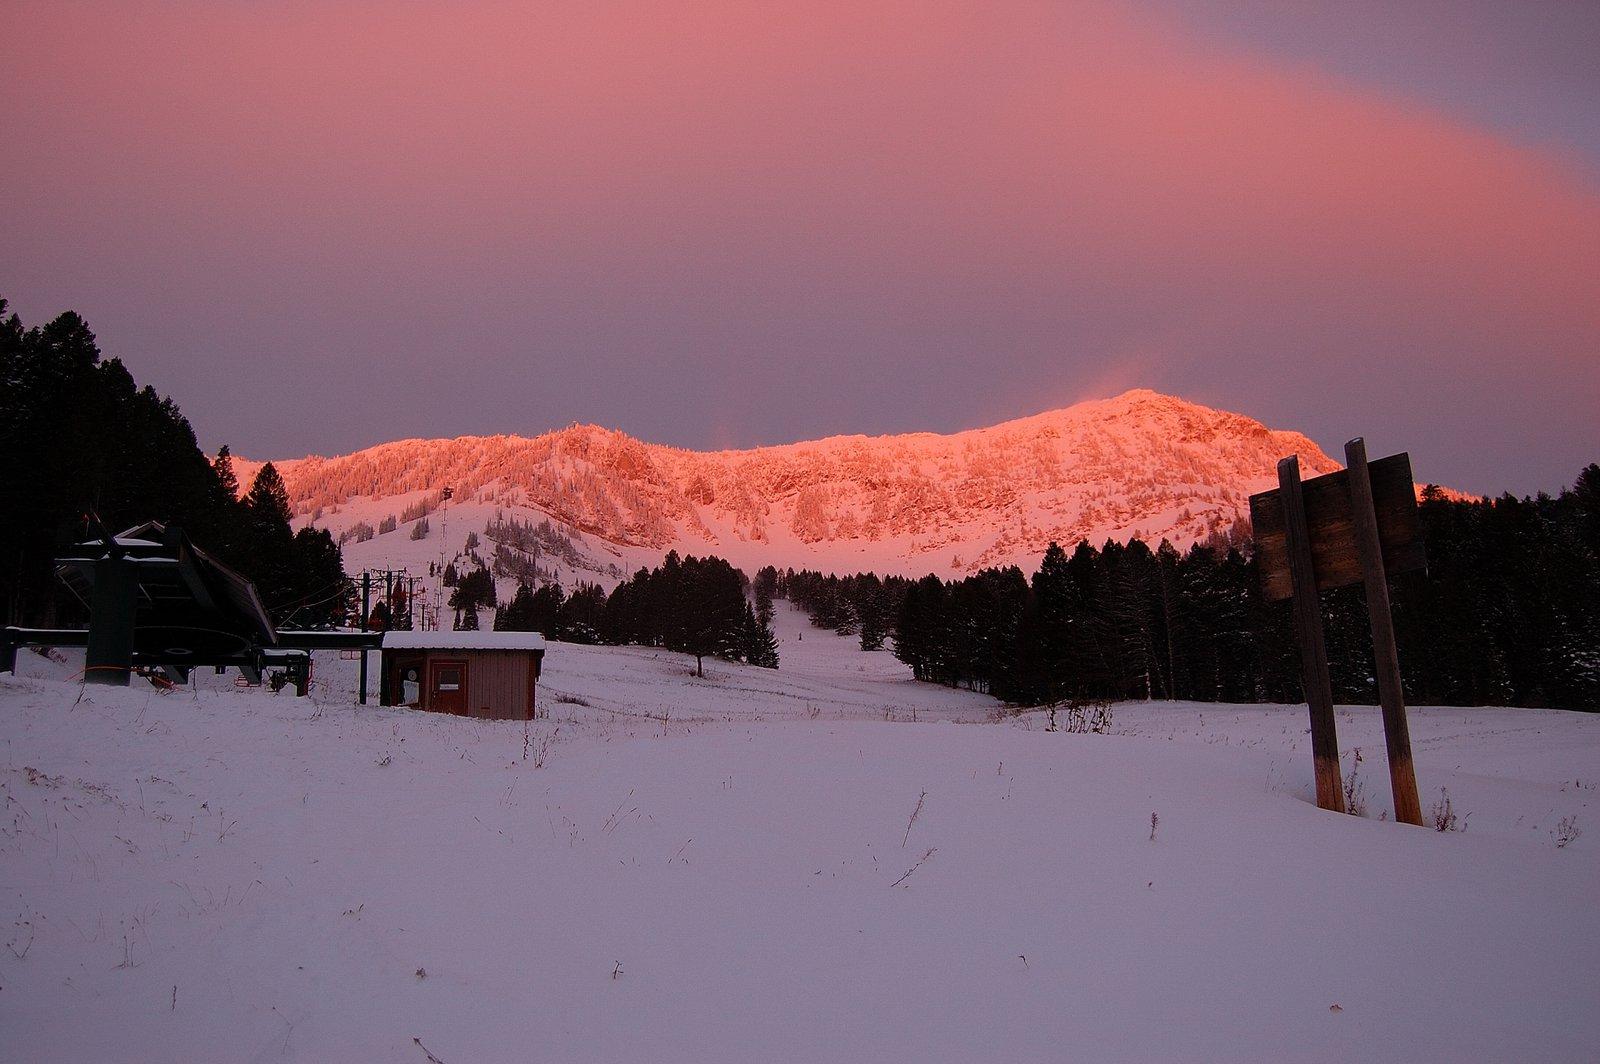 Bridger bowl sunrise. October 13th 4 am hike to the ridge to catch sunrise and slay